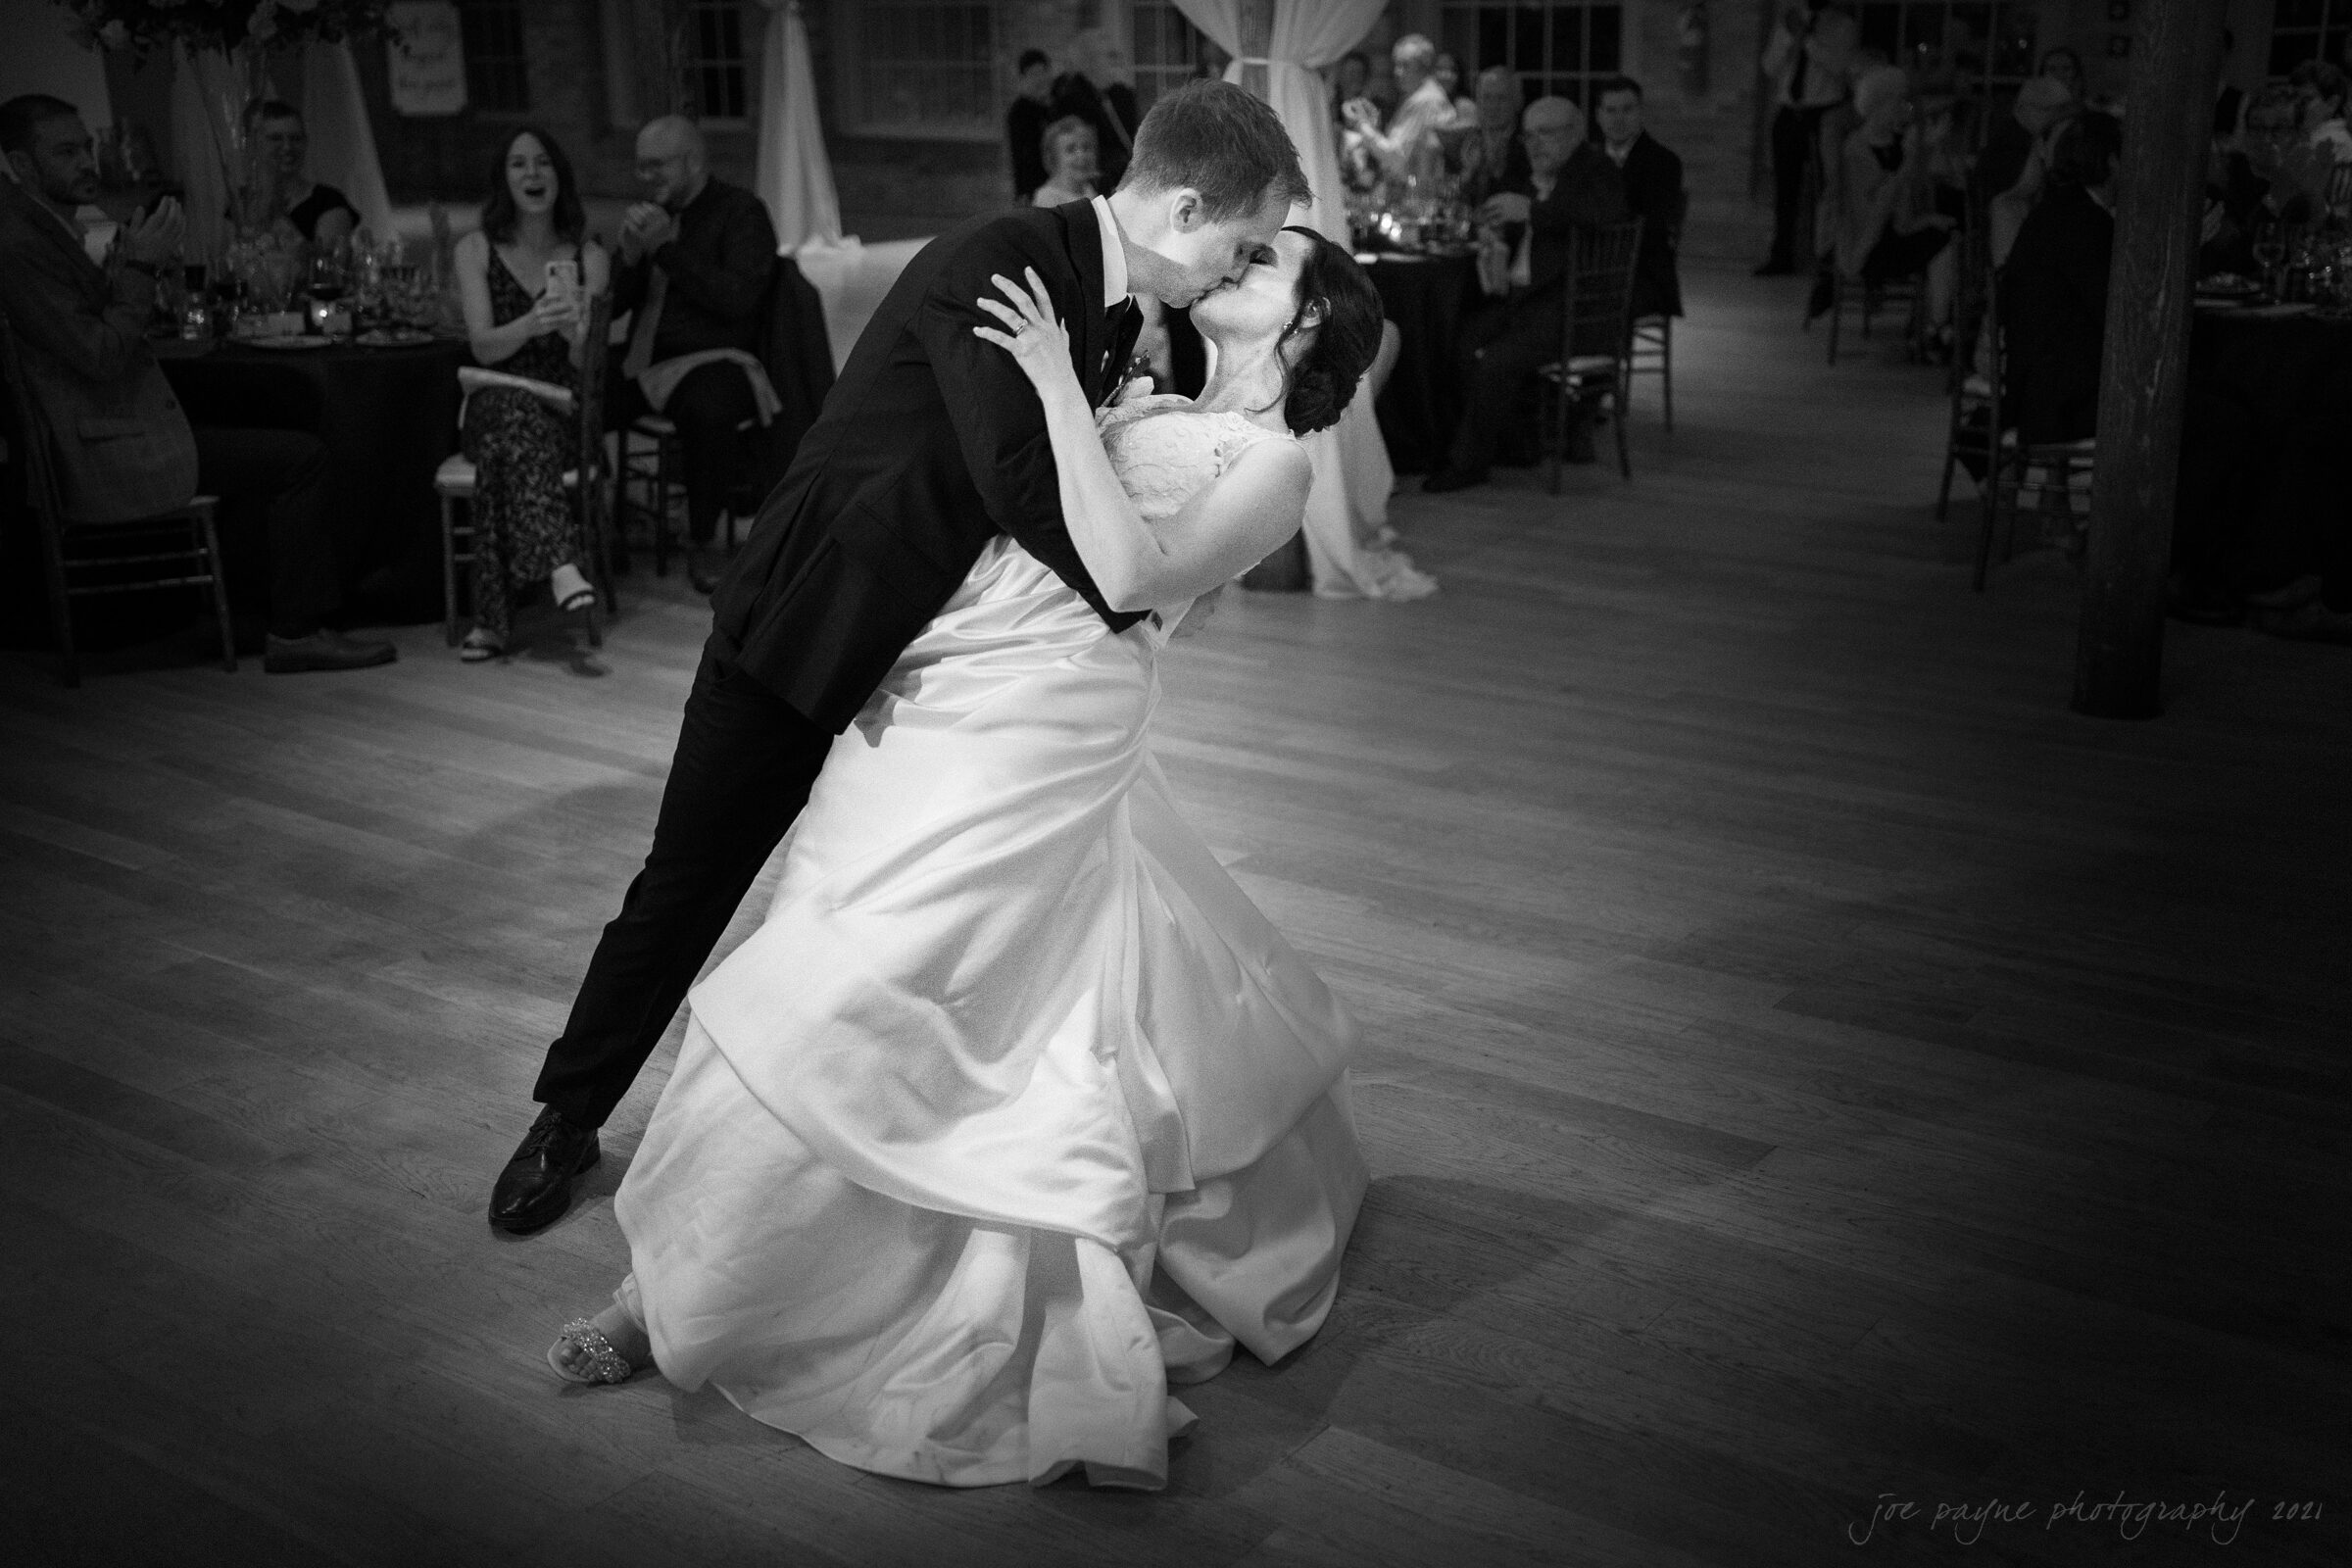 Cotton Room Wedding Photographer Kate Martin 37